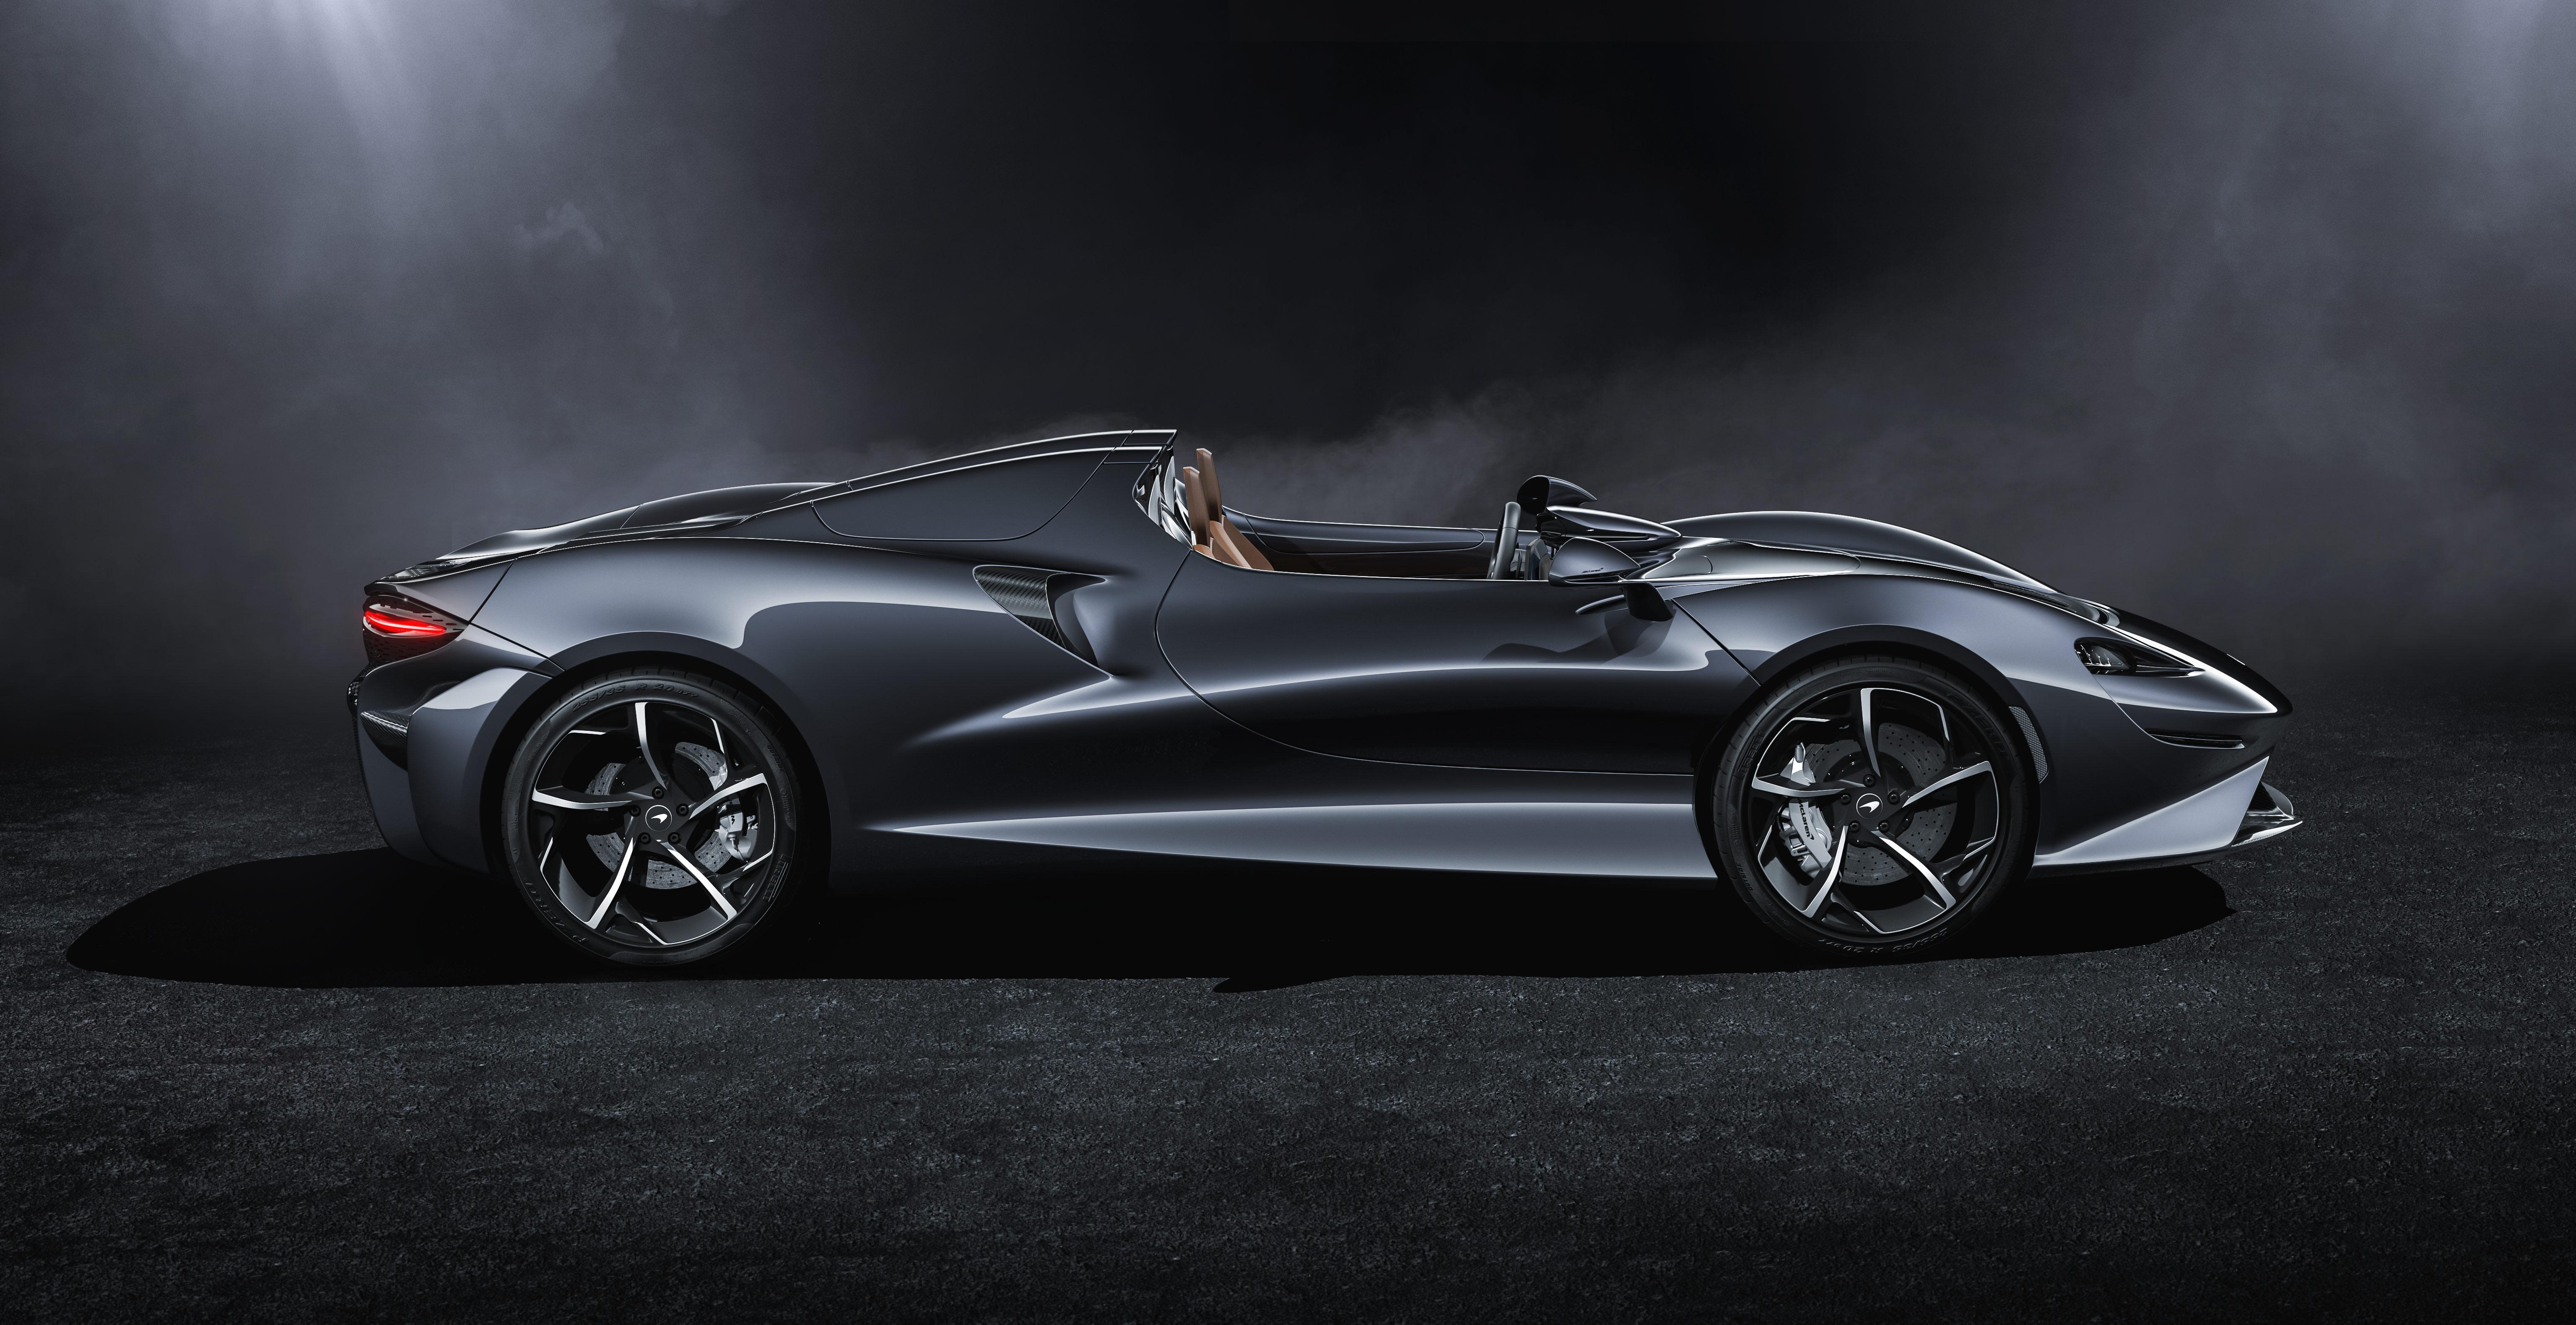 2020 mclaren elva 1577652476 - 2020 McLaren Elva - 2020 McLaren Elva 4k wallpaper